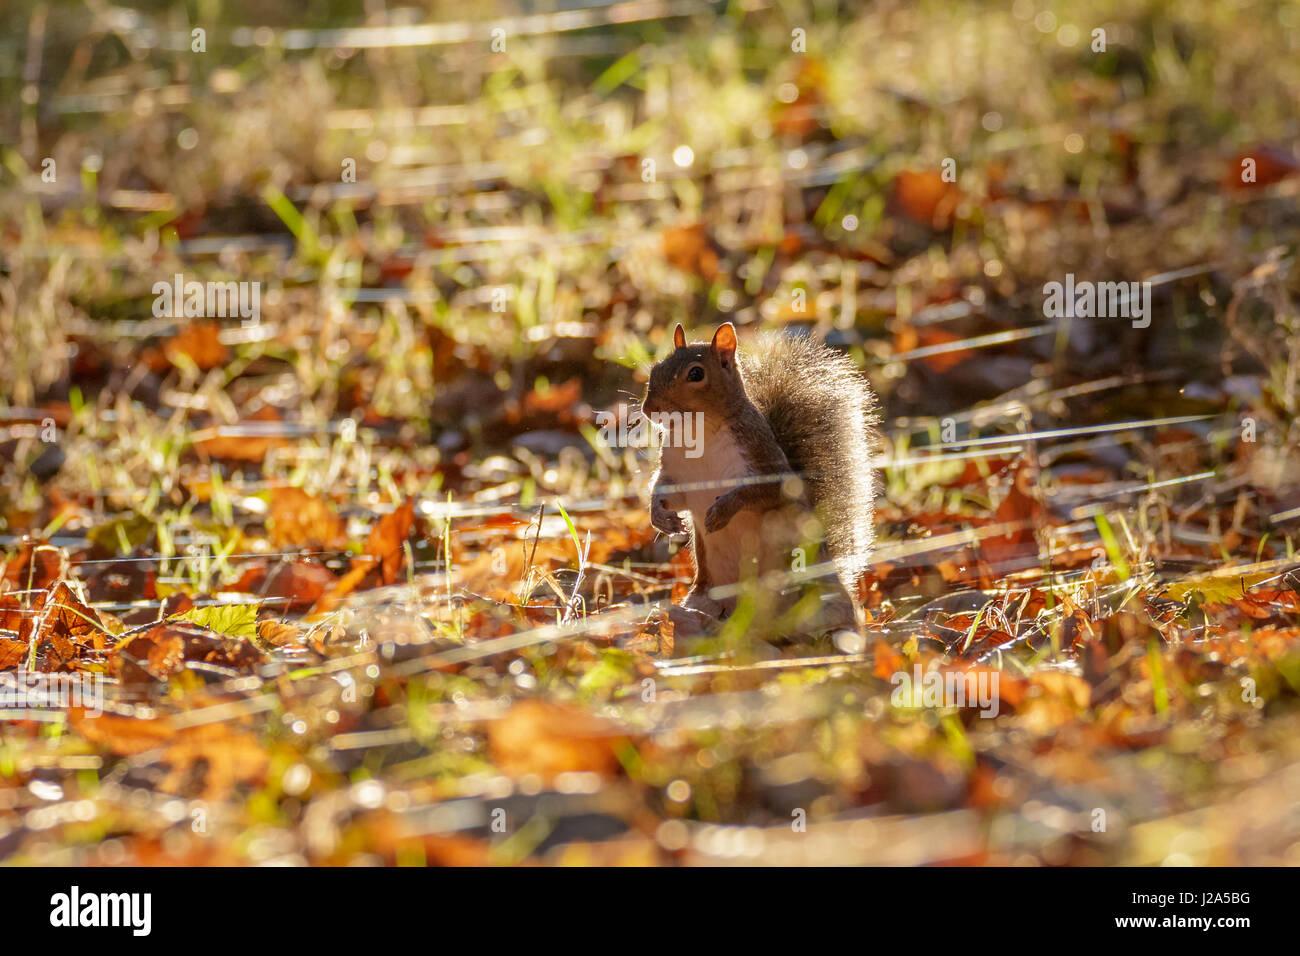 Grey or Gray Squirrel (Sciurus carolinensis) foraging in an autumn wood - Stock Image